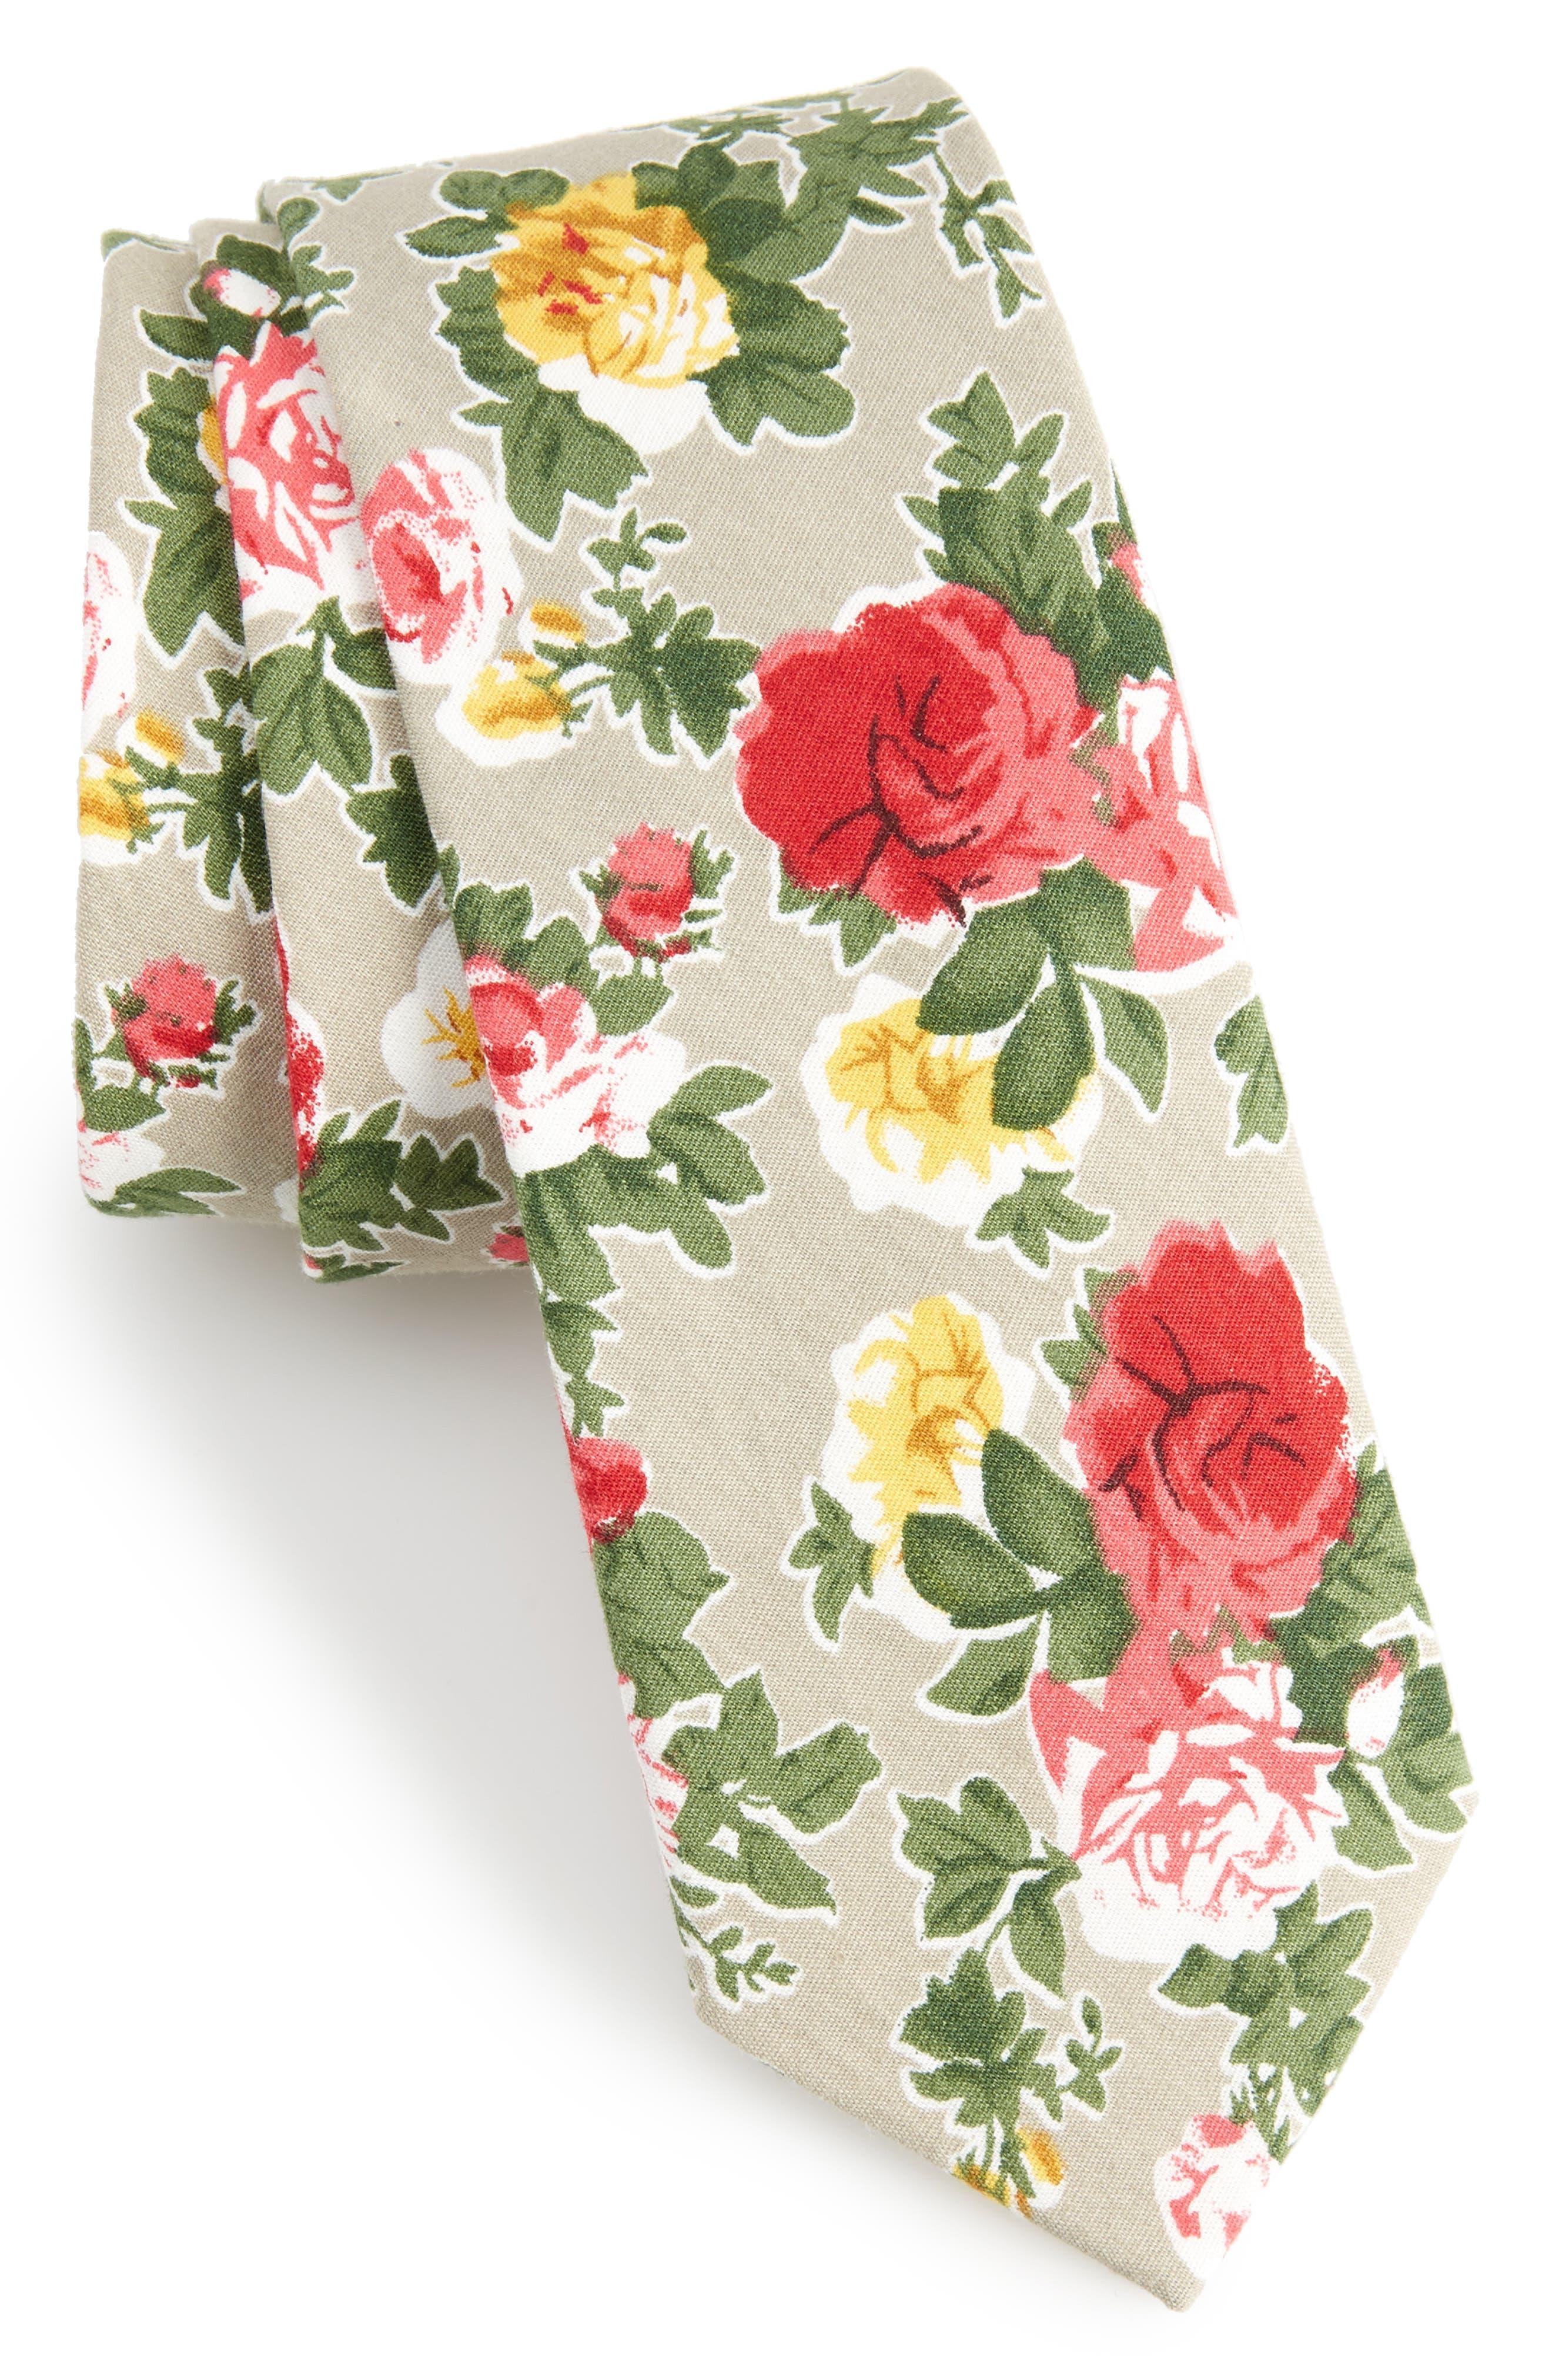 Iverson Floral Cotton Skinny Tie,                             Main thumbnail 1, color,                             329